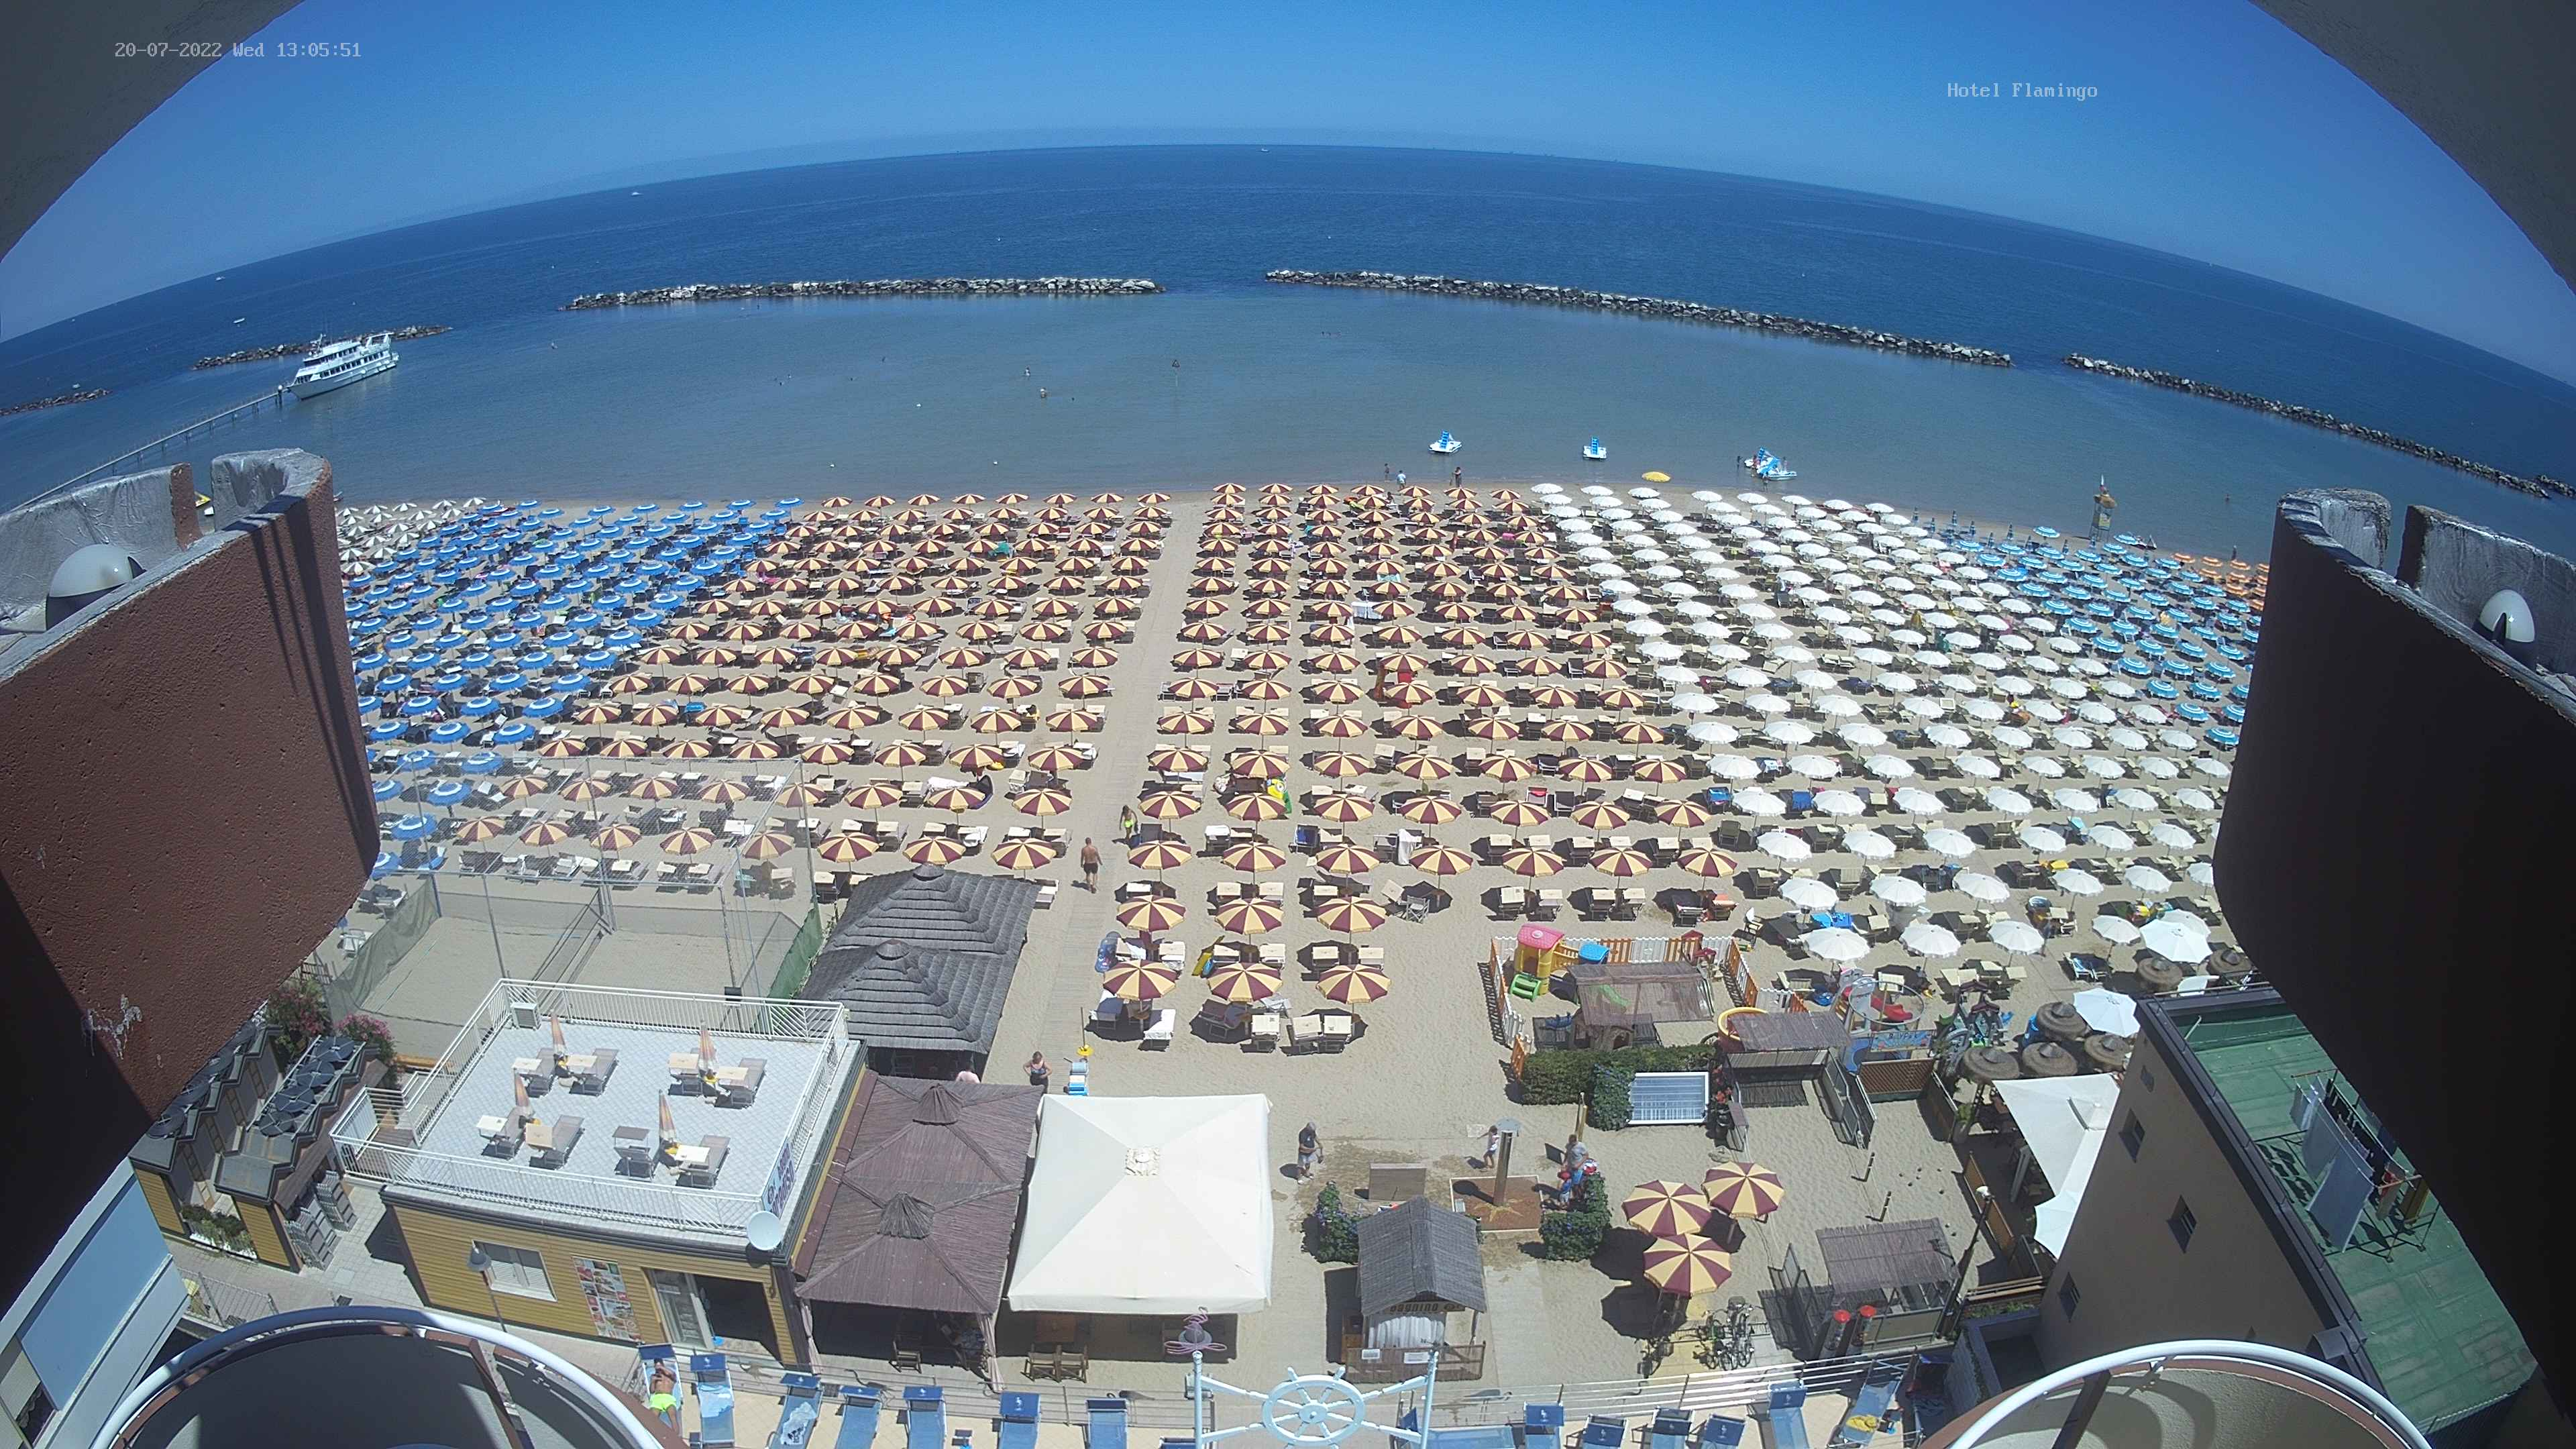 Webcam Hotel Flamingo Gatteo Mare